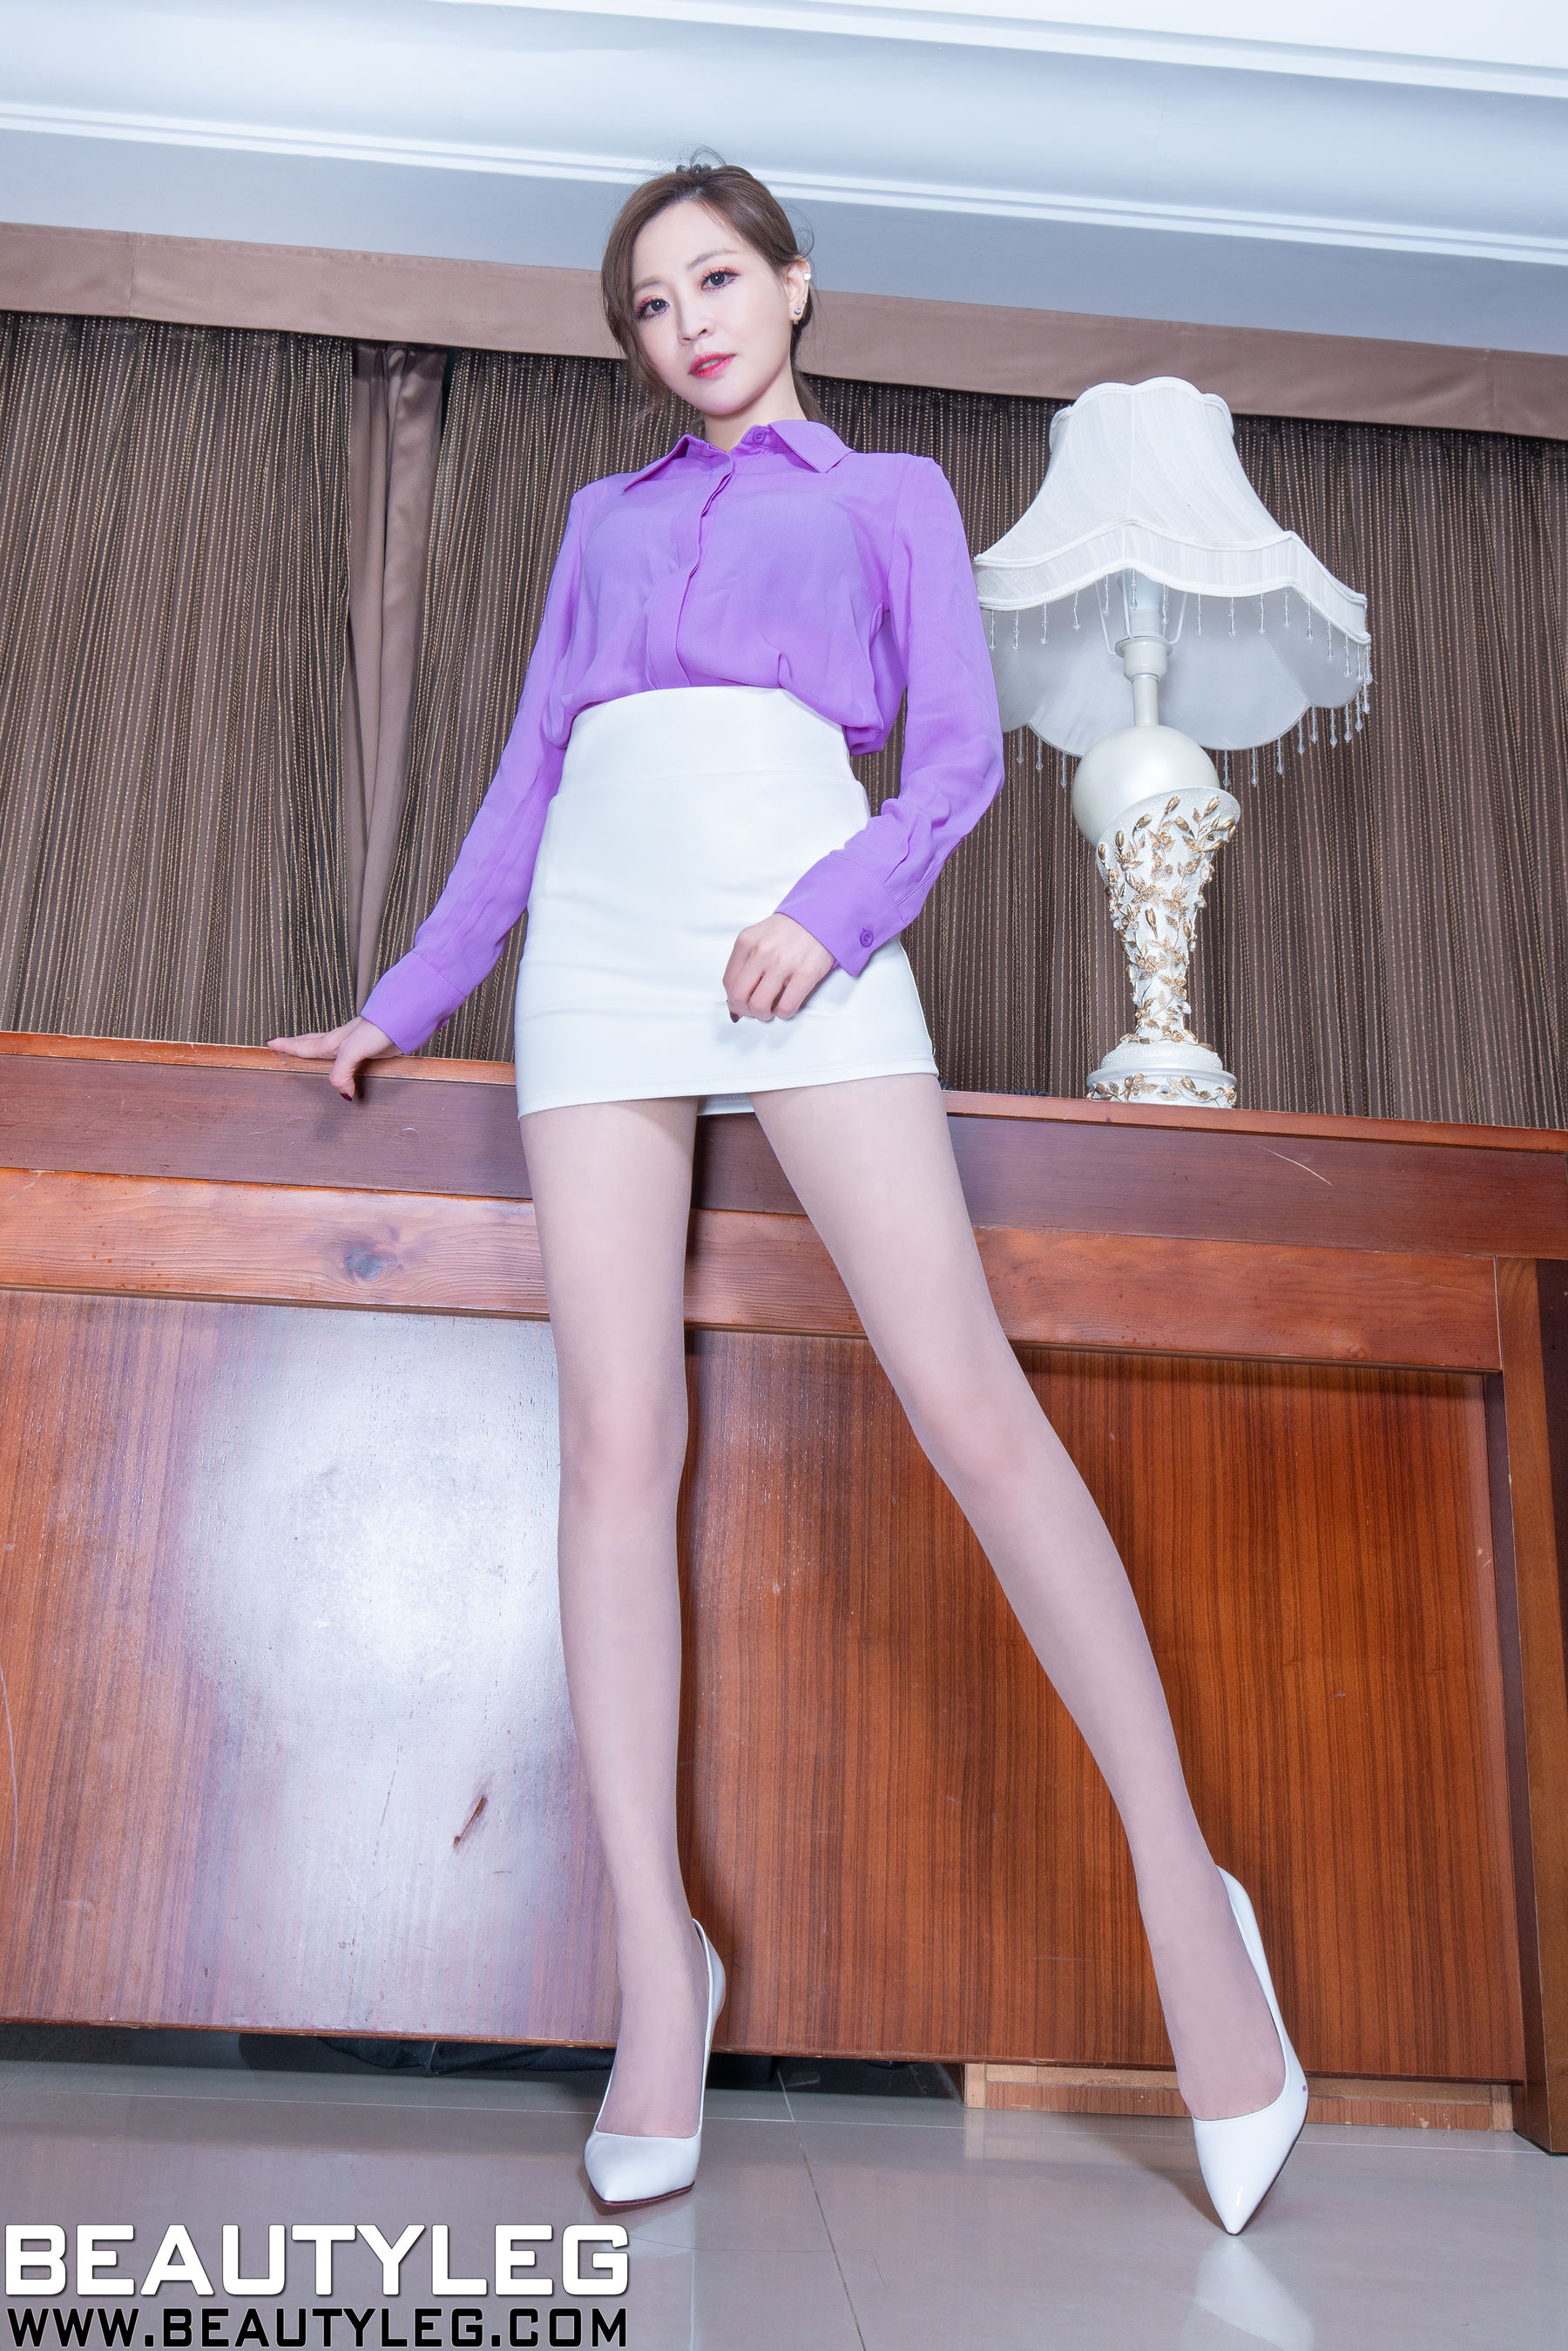 VOL.1921 [Beautyleg]制服美腿肉丝袜:倪千凌(腿模Lucy,陈佳筠)超高清个人性感漂亮大图(60P)